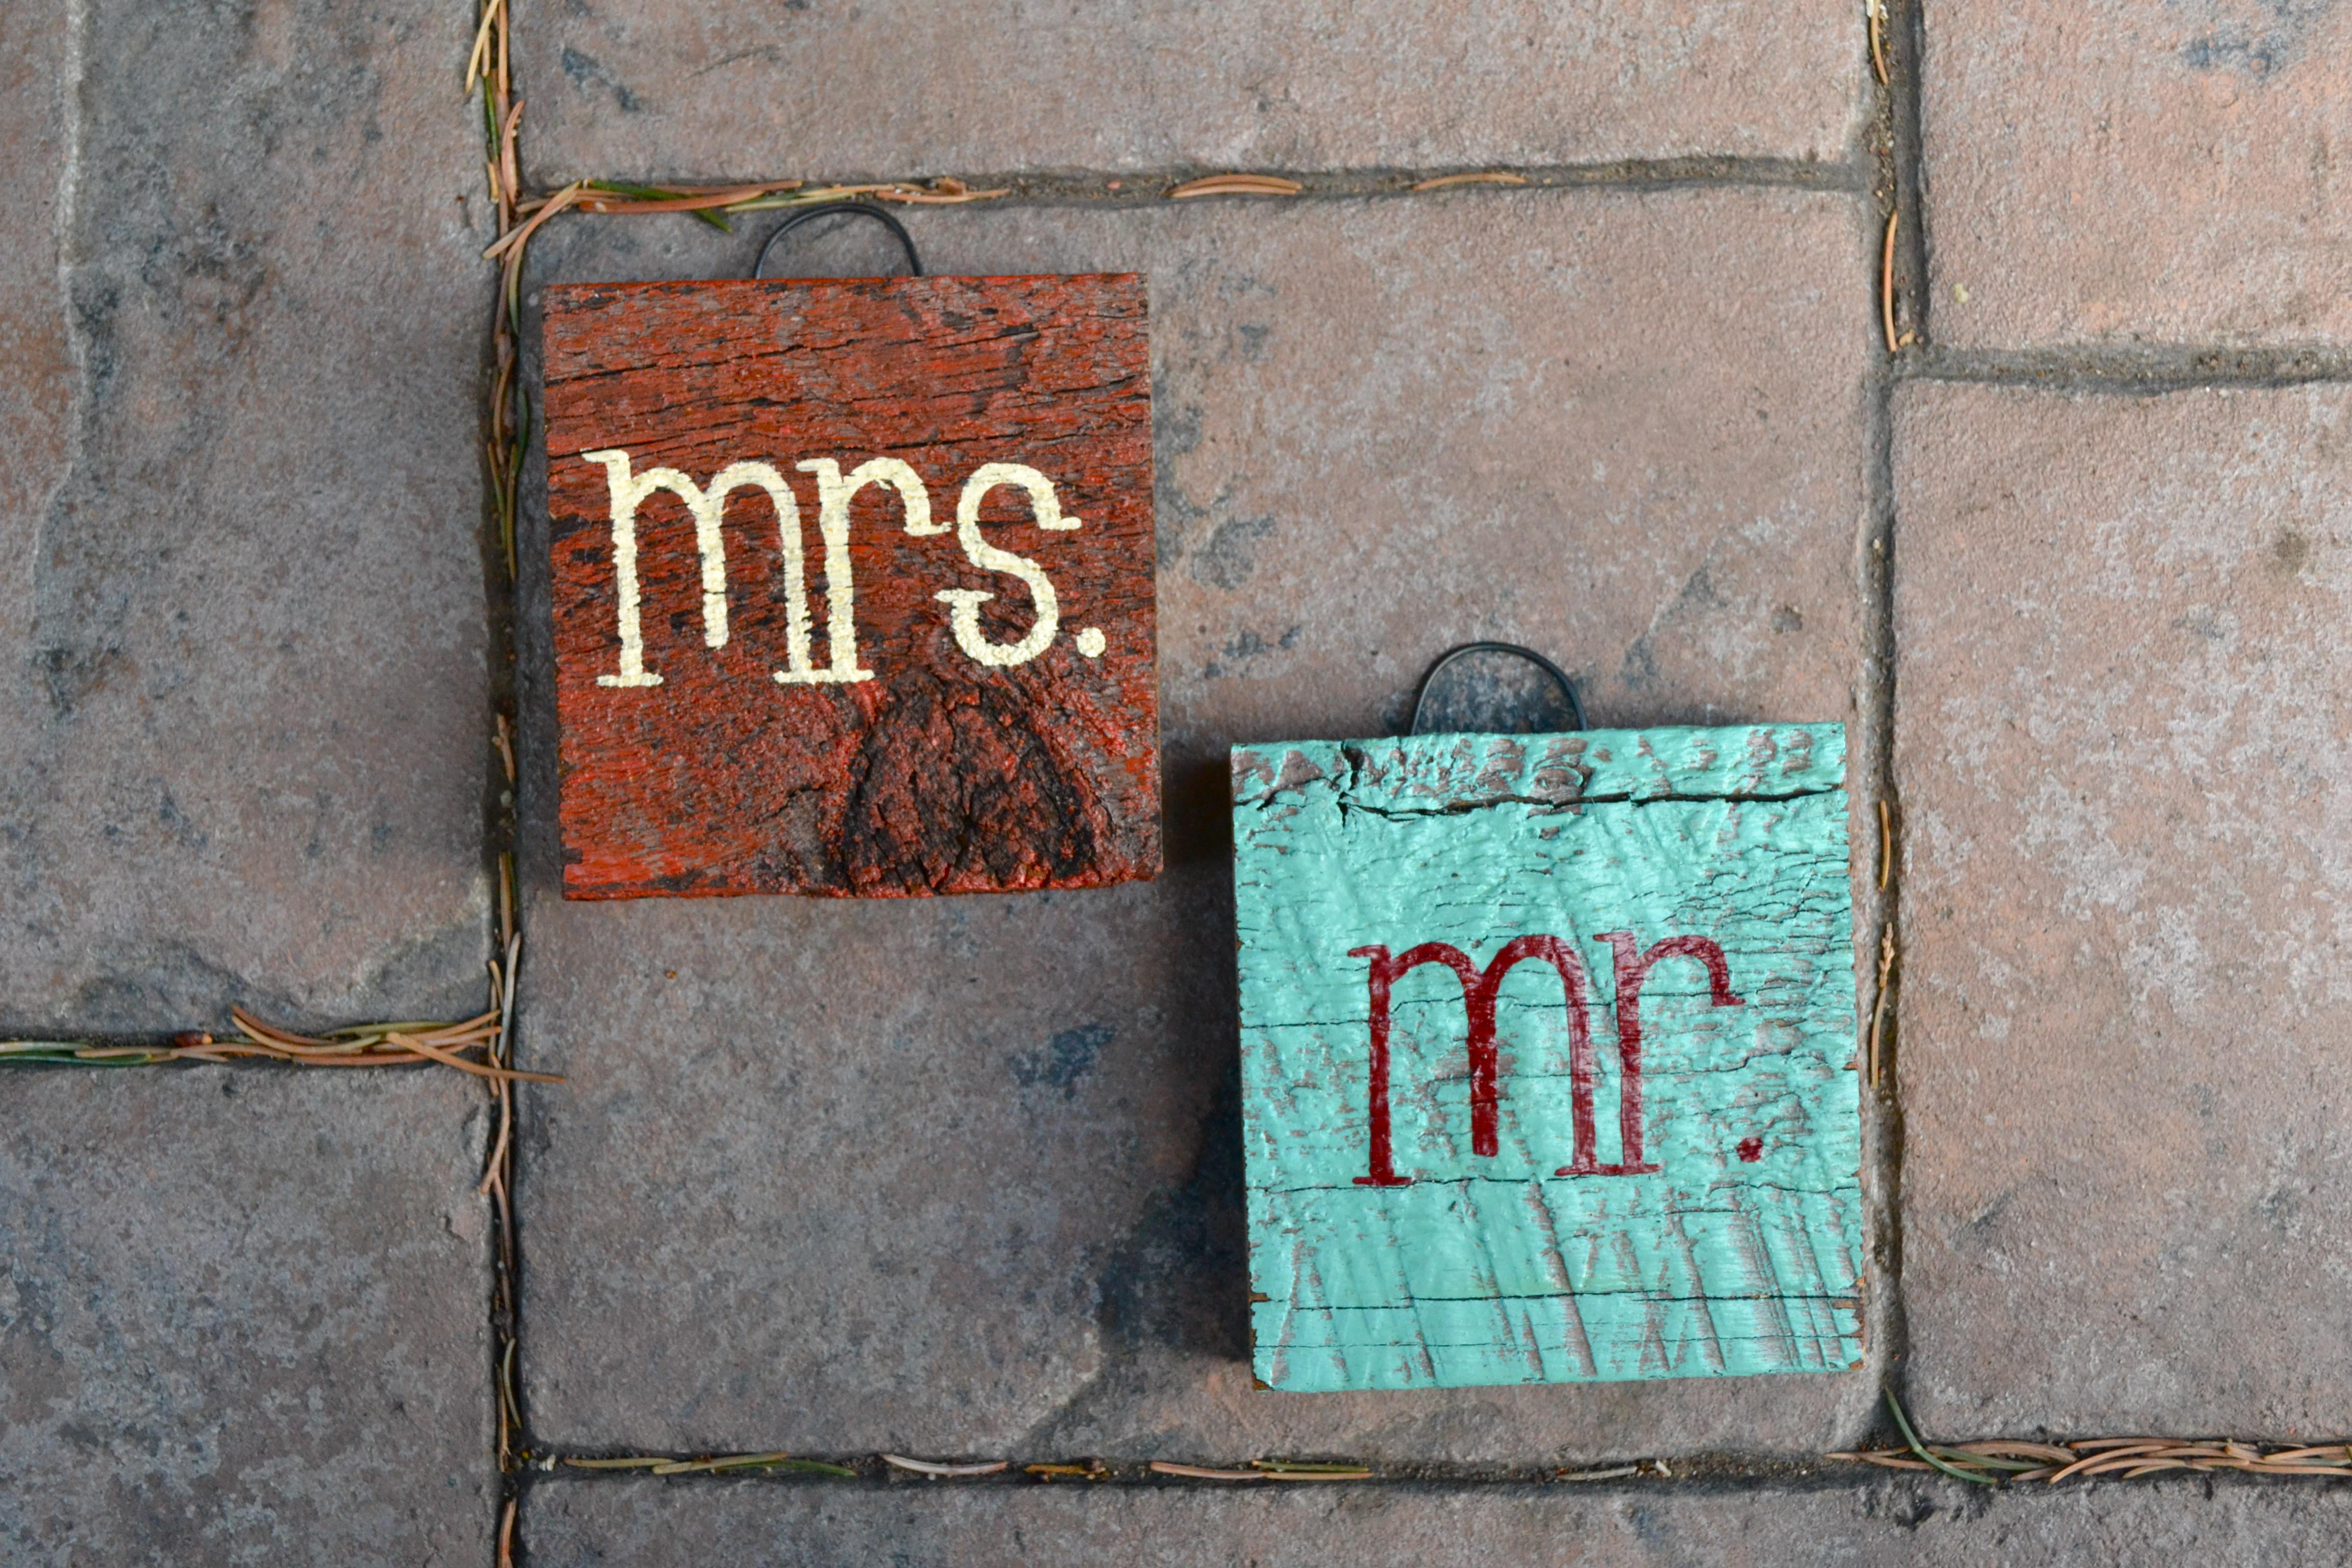 mR. & MrS. blocks